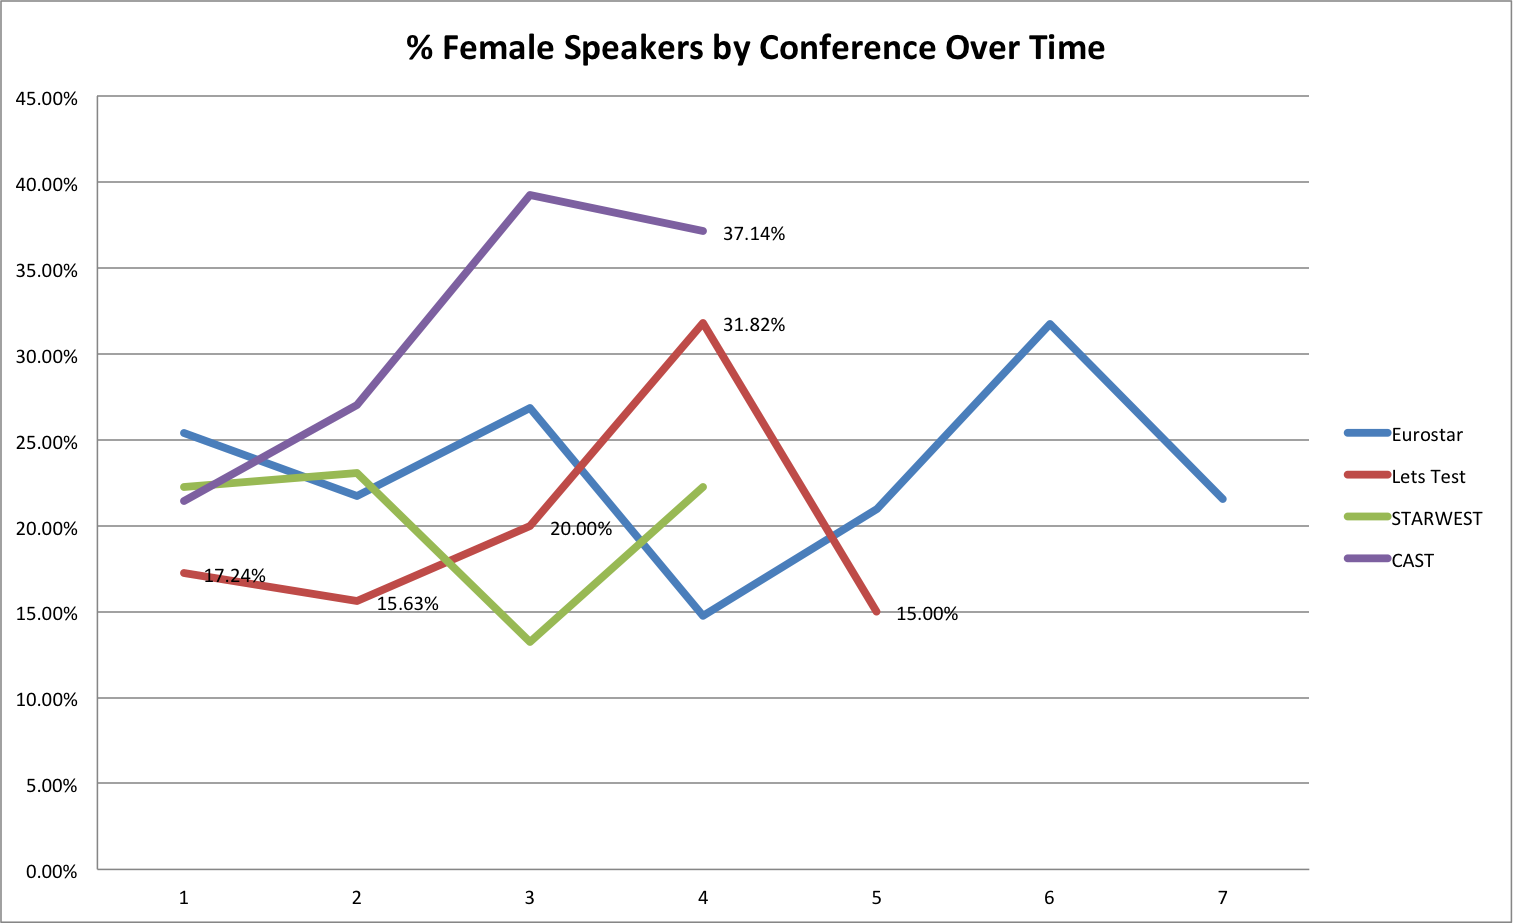 FemaleSpeakersByConferenceTime